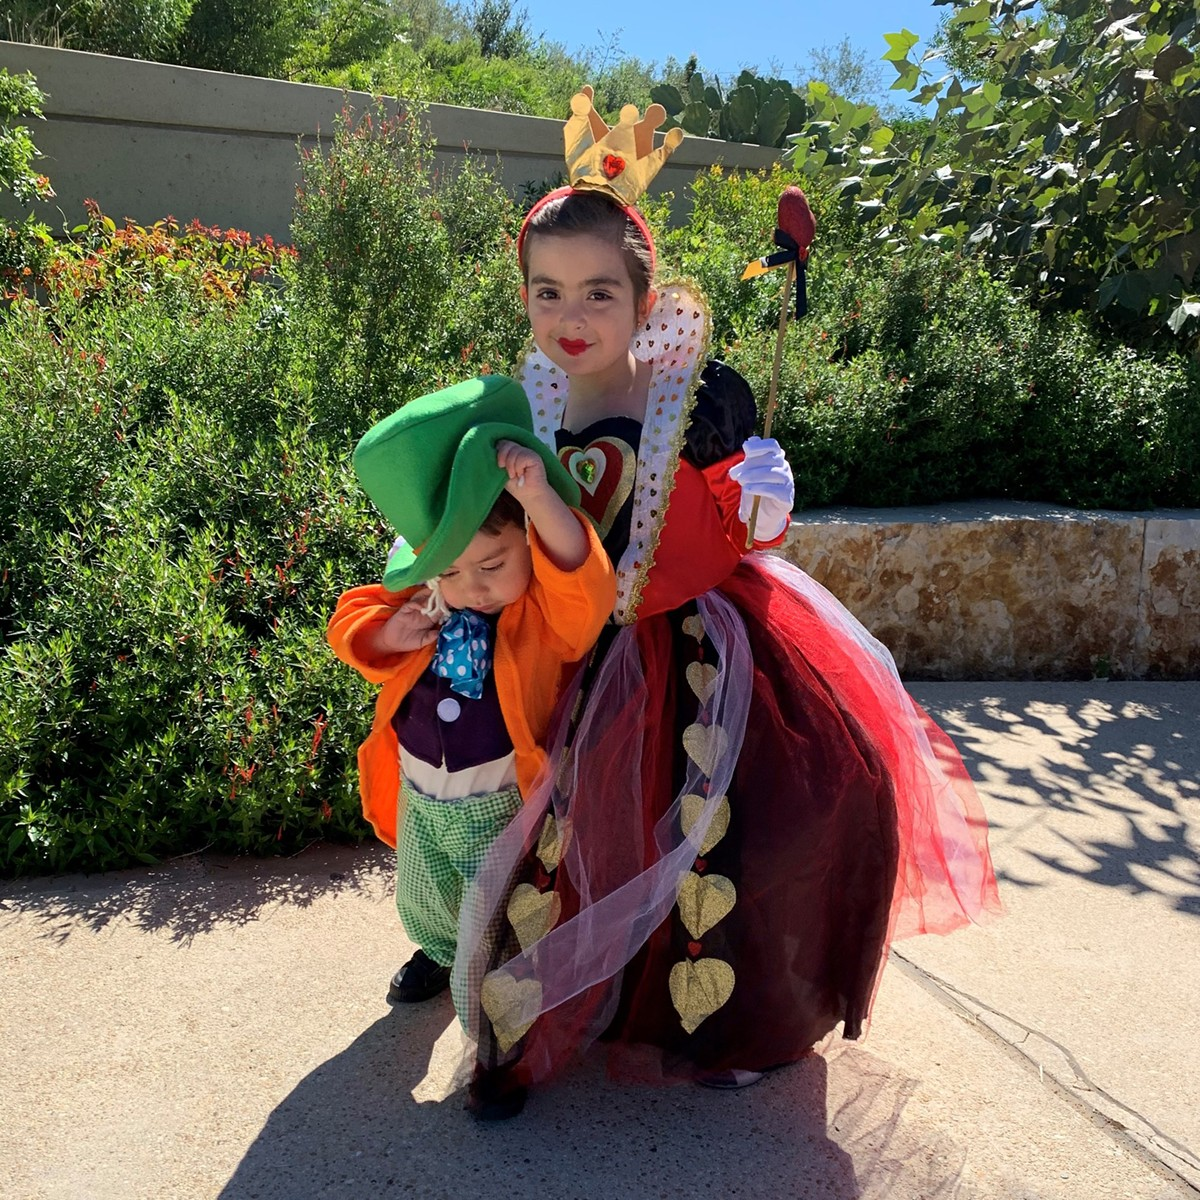 San Antonio Halloween 2020 Events Bootanica returns to the San Antonio Botanical Garden for outdoor